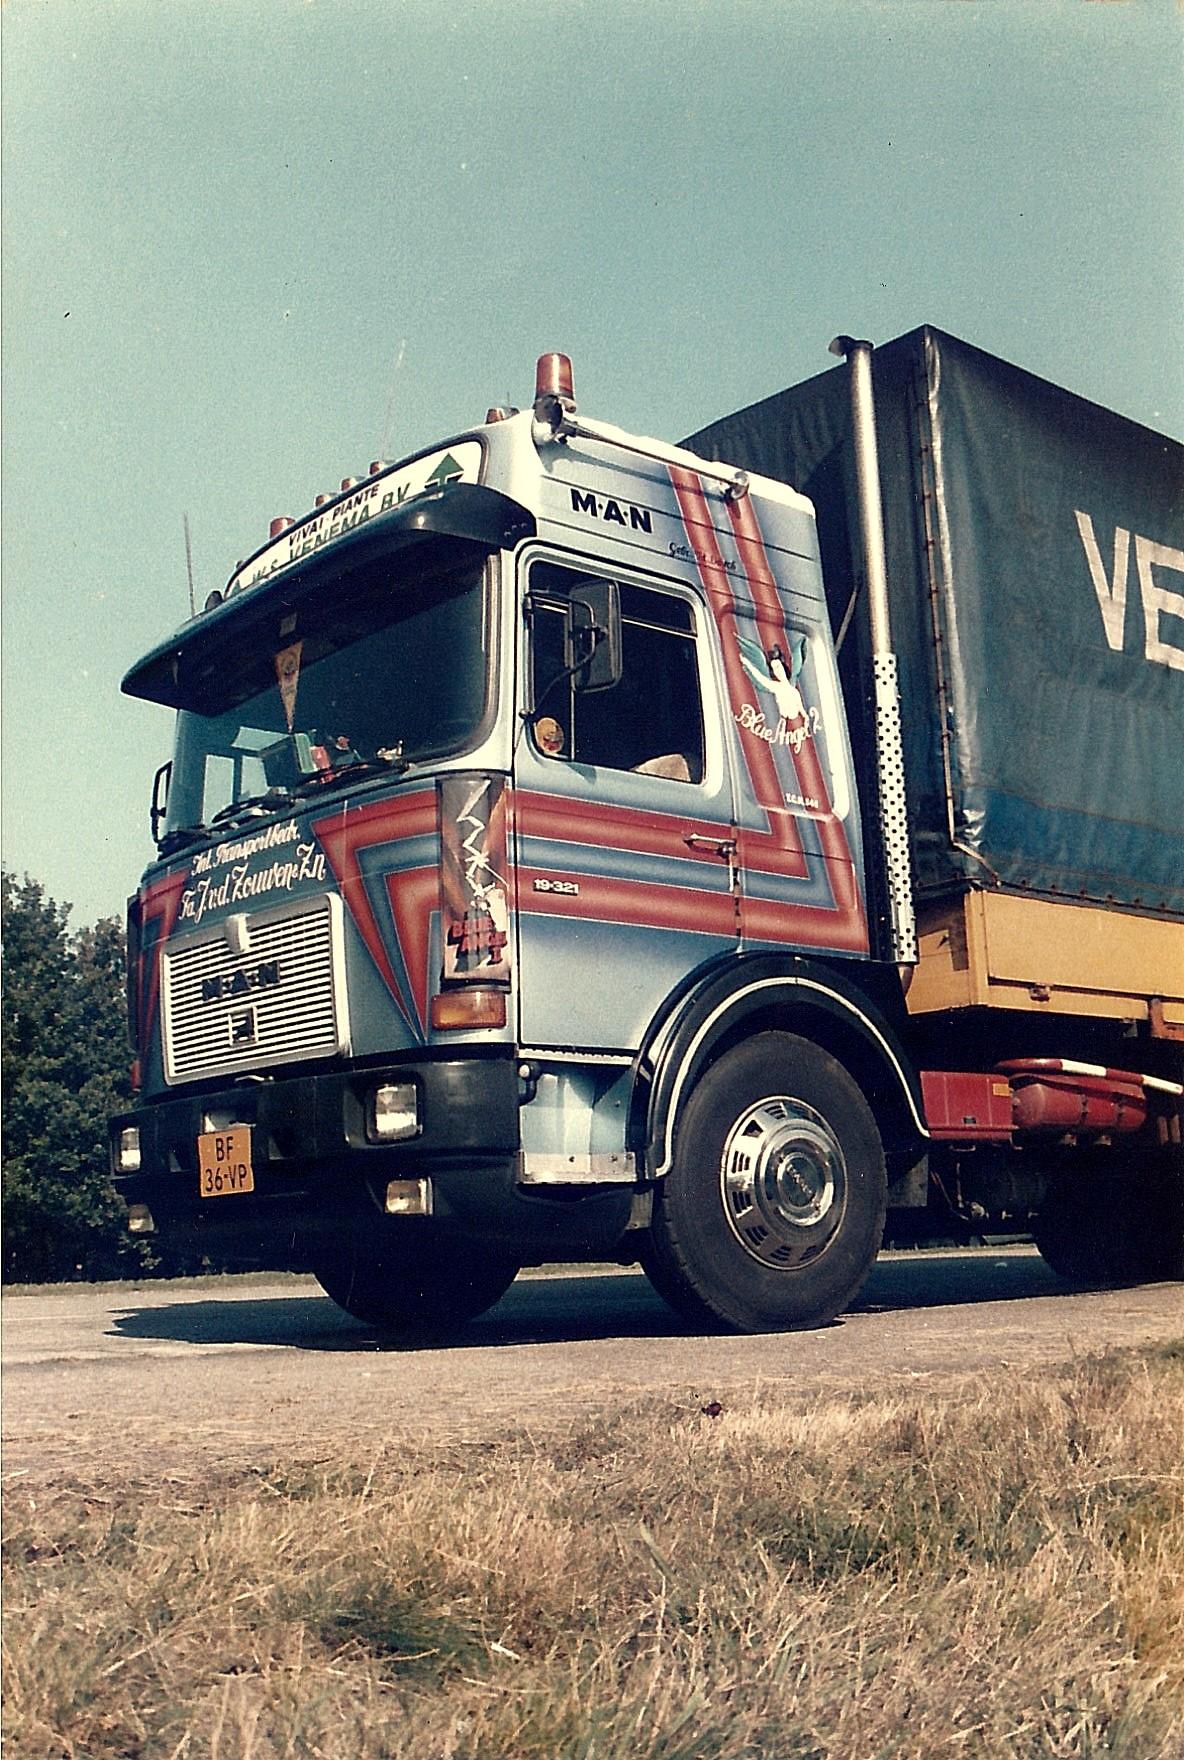 Bas-van-der-Zouwen-foto-archief-(10)